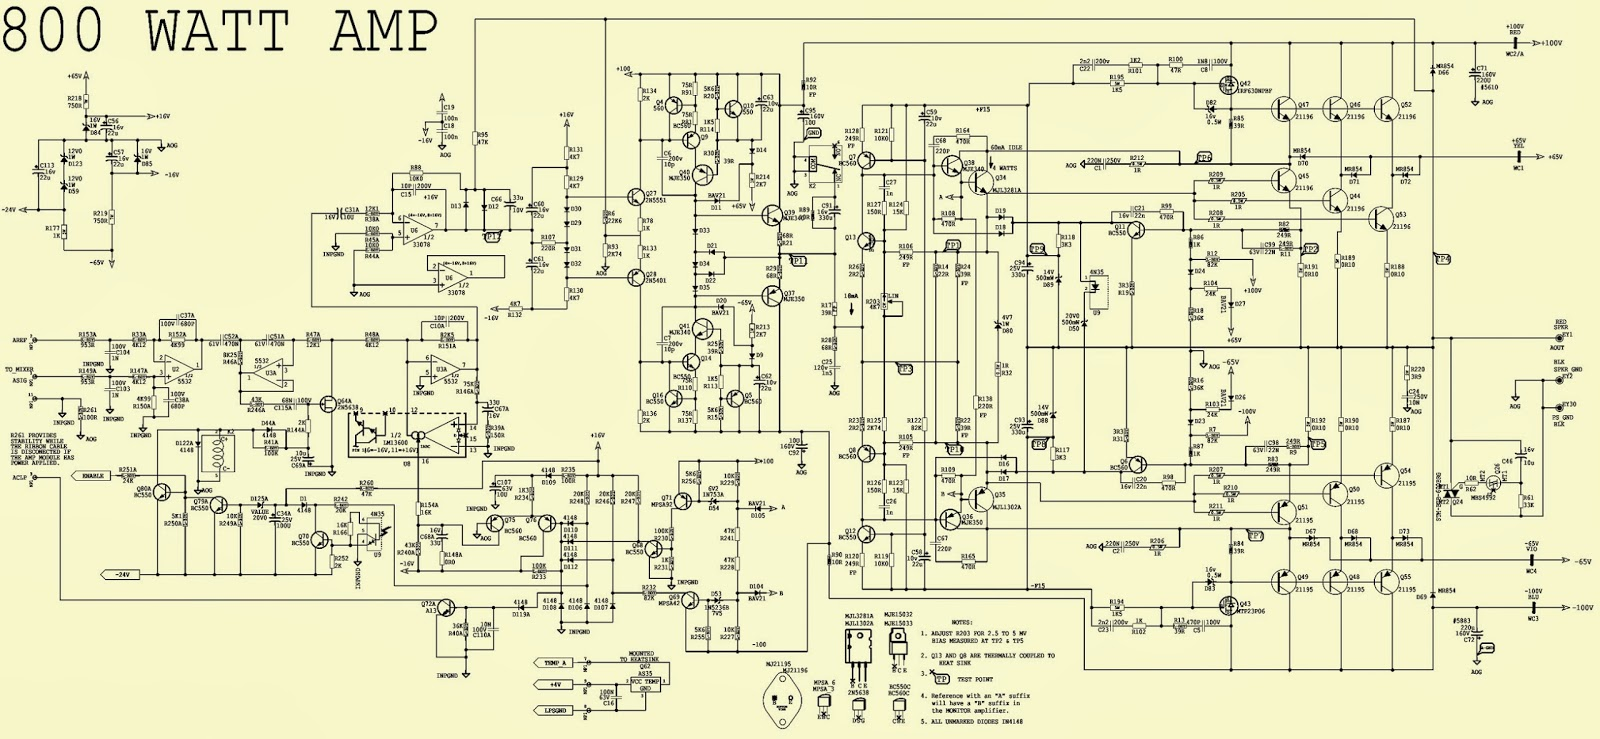 800watts amplifier circuit diagram 800 watts amp 800watts amplifier circuit diagram [ 1600 x 739 Pixel ]